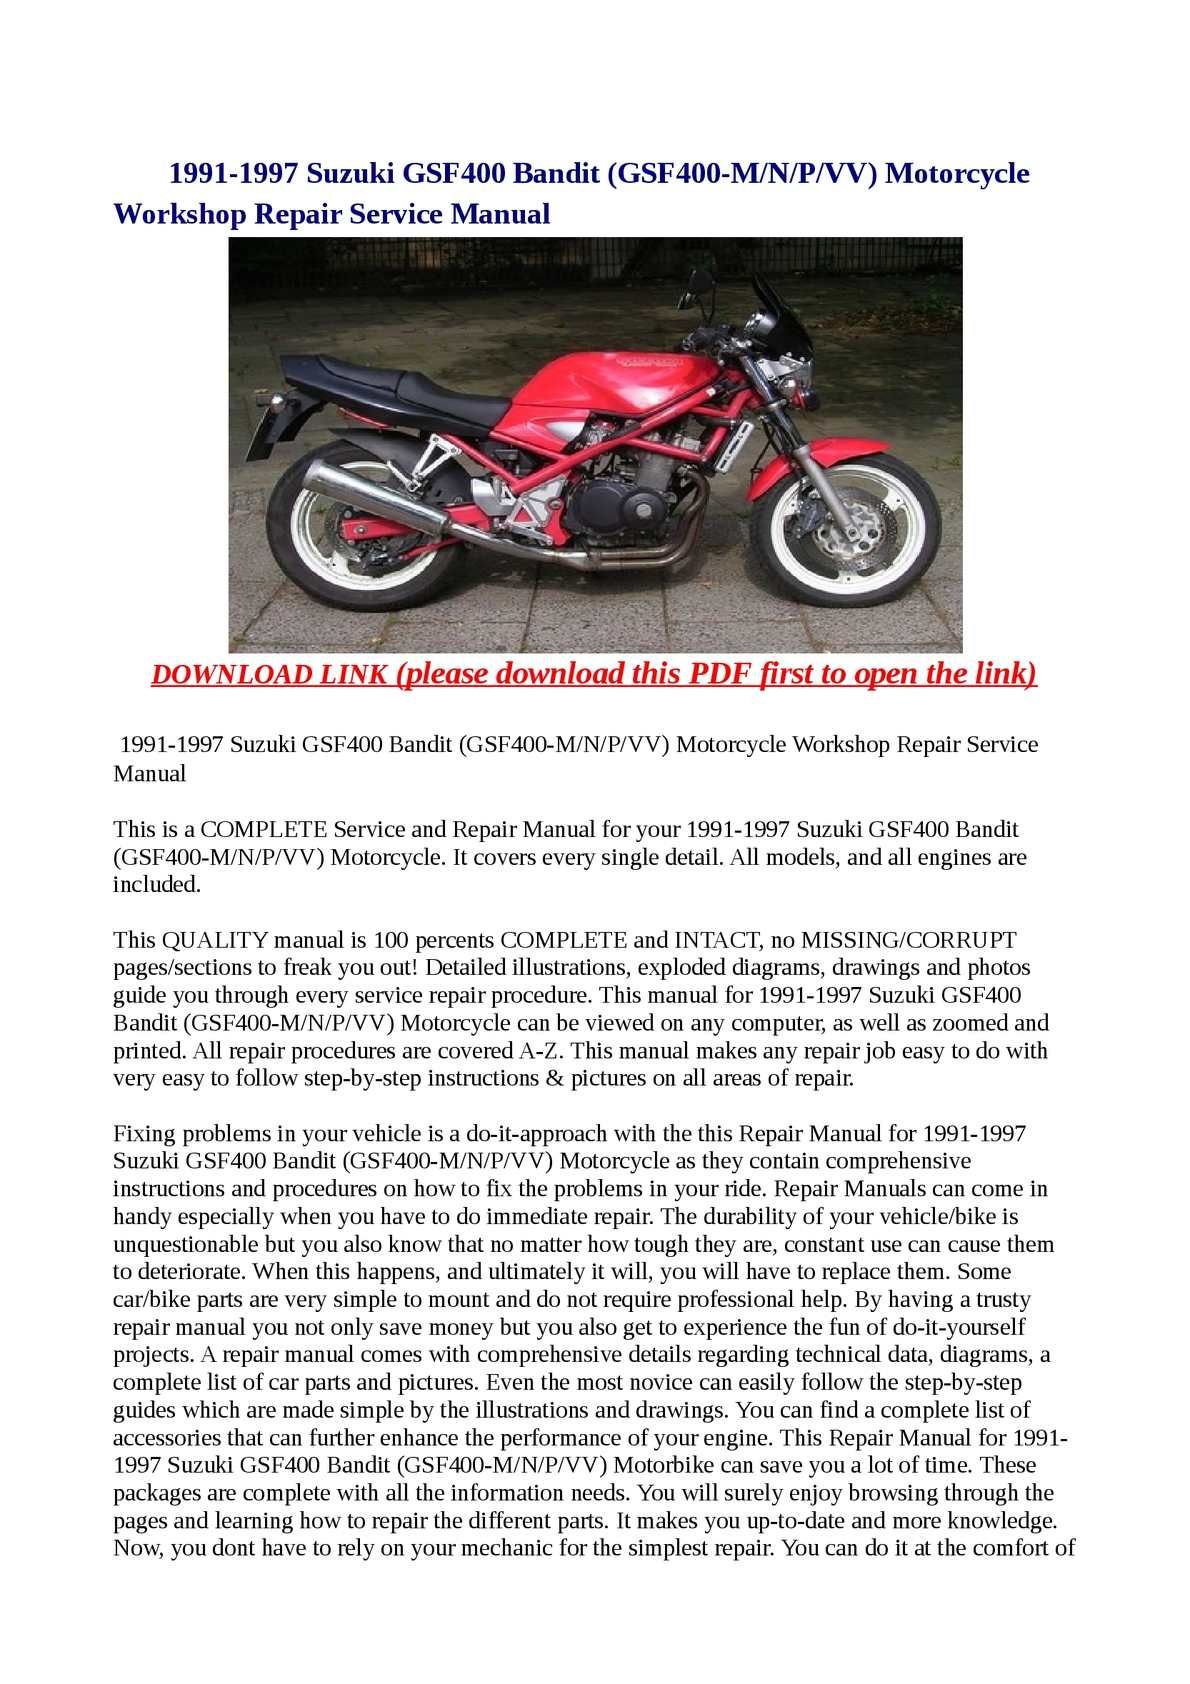 Calameo 1991 1997 Suzuki Gsf400 Bandit Gsf400 M N P Vv Motorcycle Workshop Repair Service Manual